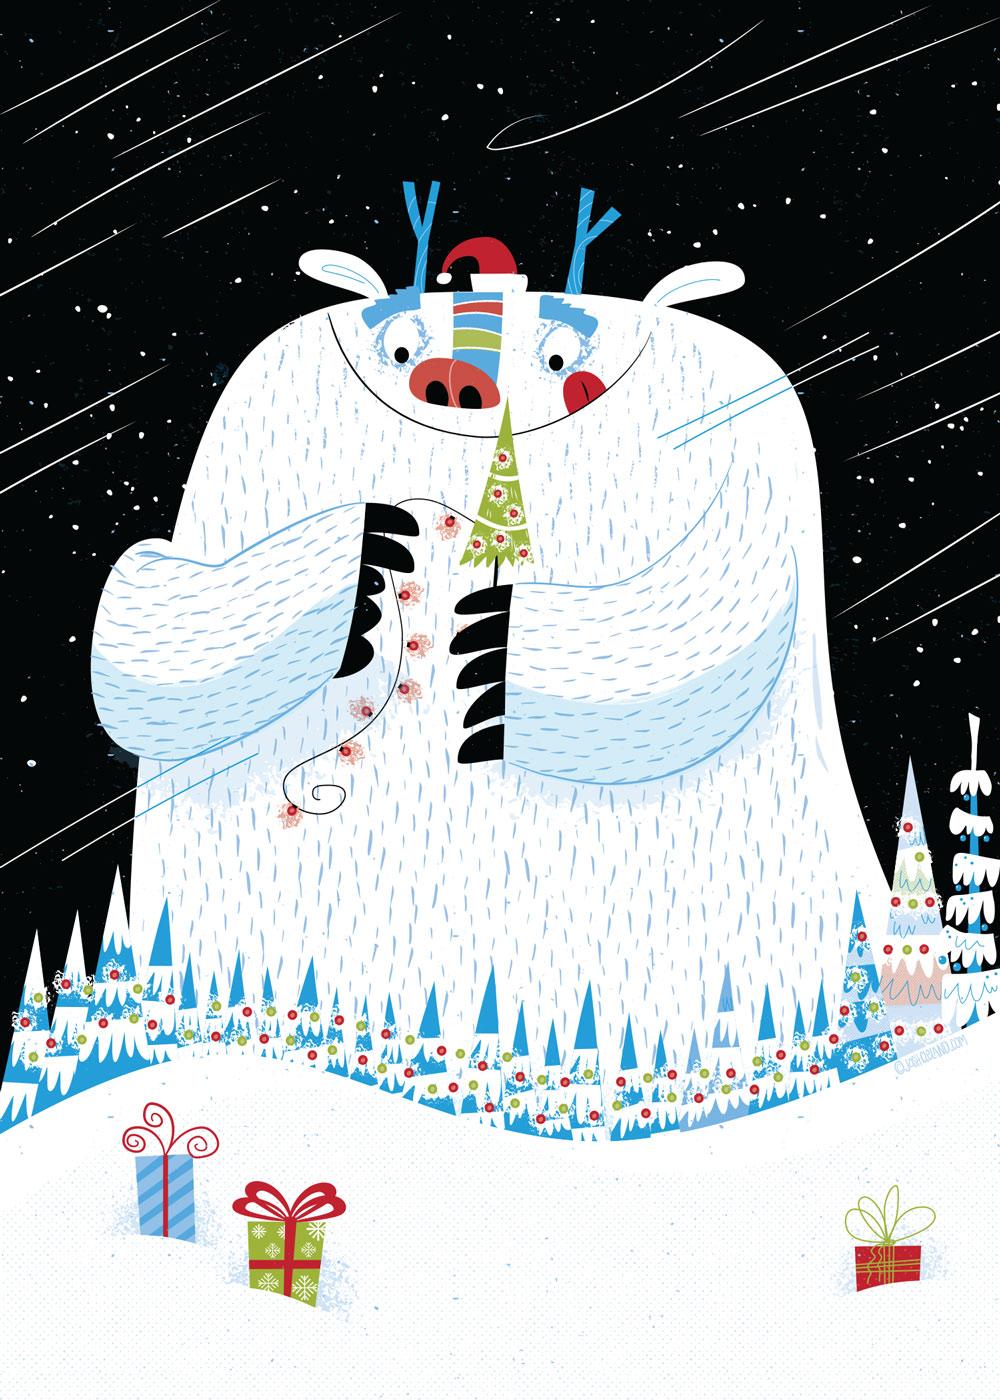 Christmas yeti greeting card by Josh Cleland